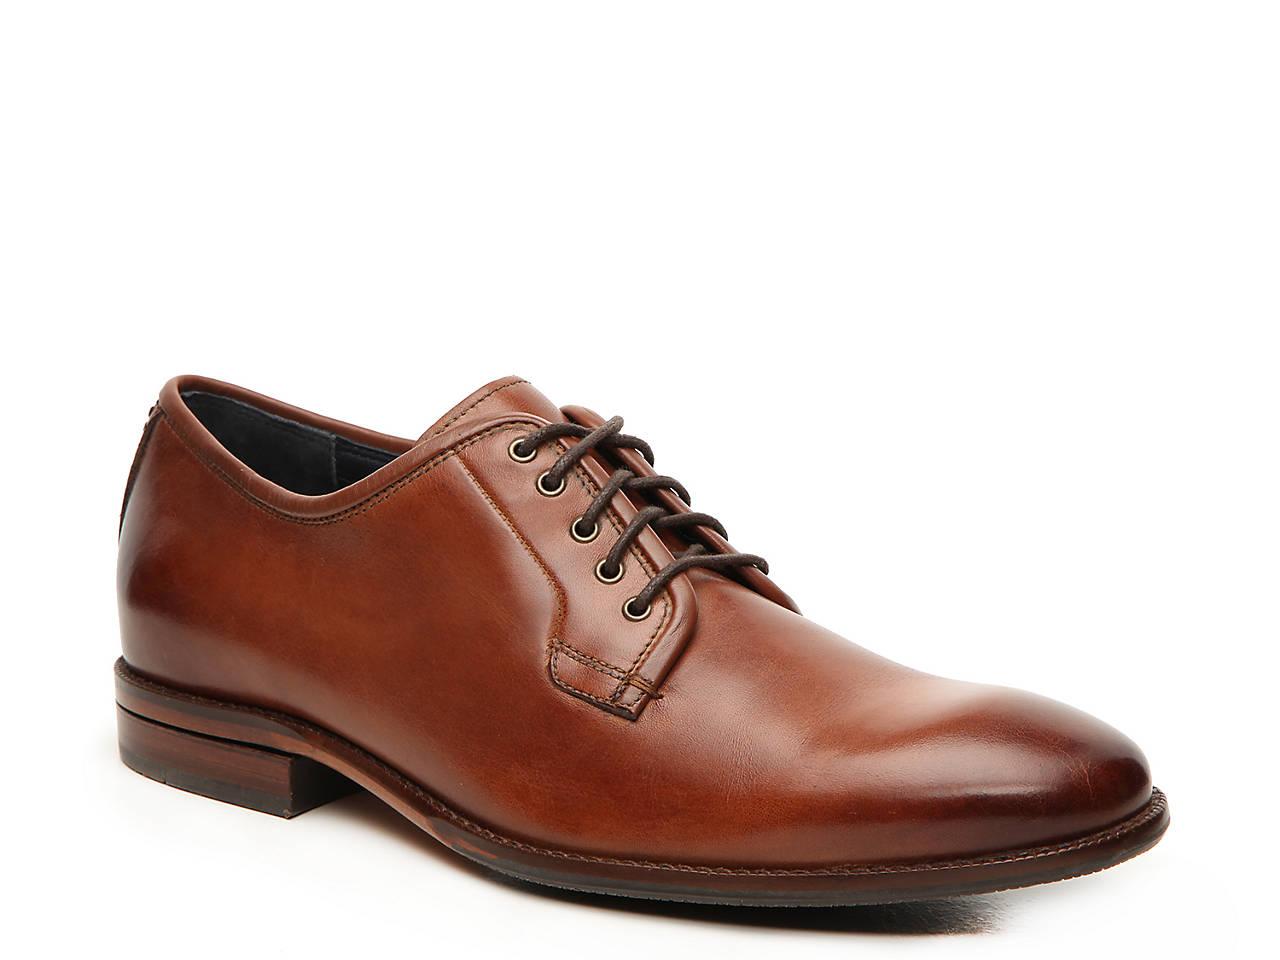 277e502425 Cole Haan Warner Grand Postman Oxford Men's Shoes | DSW